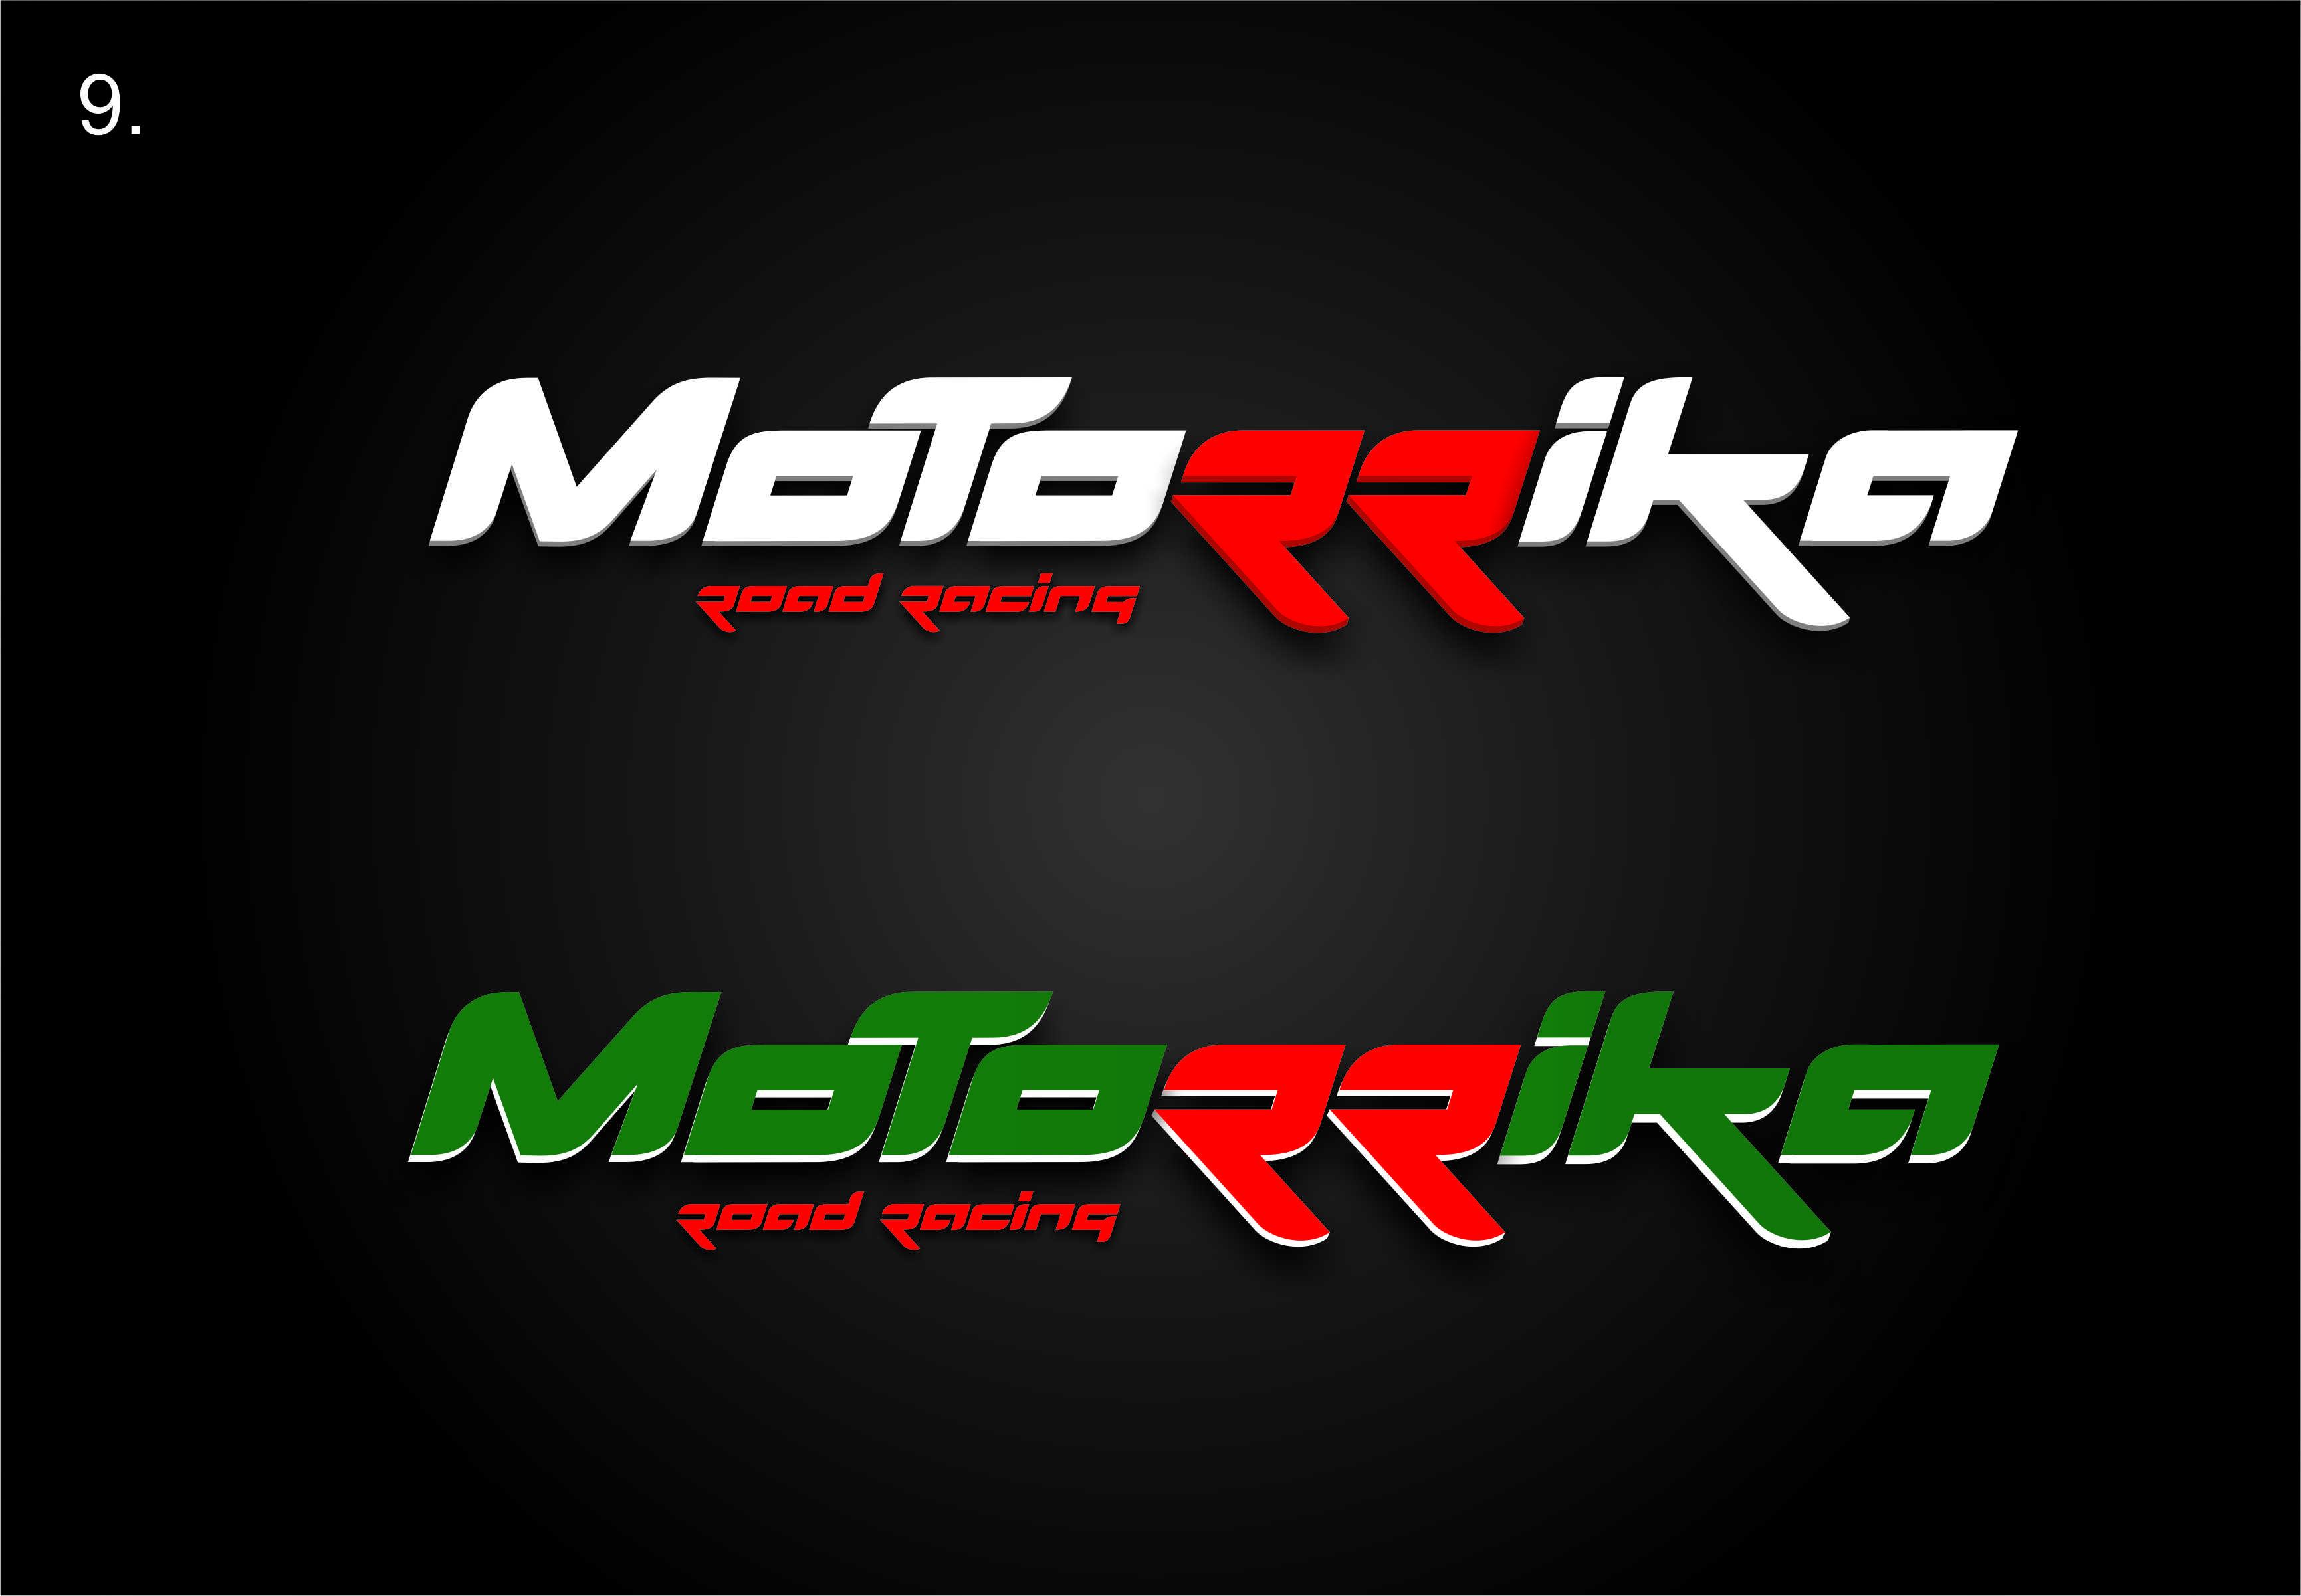 Мотогонки. Логотип, фирменный стиль. фото f_4dc182314deac.jpg